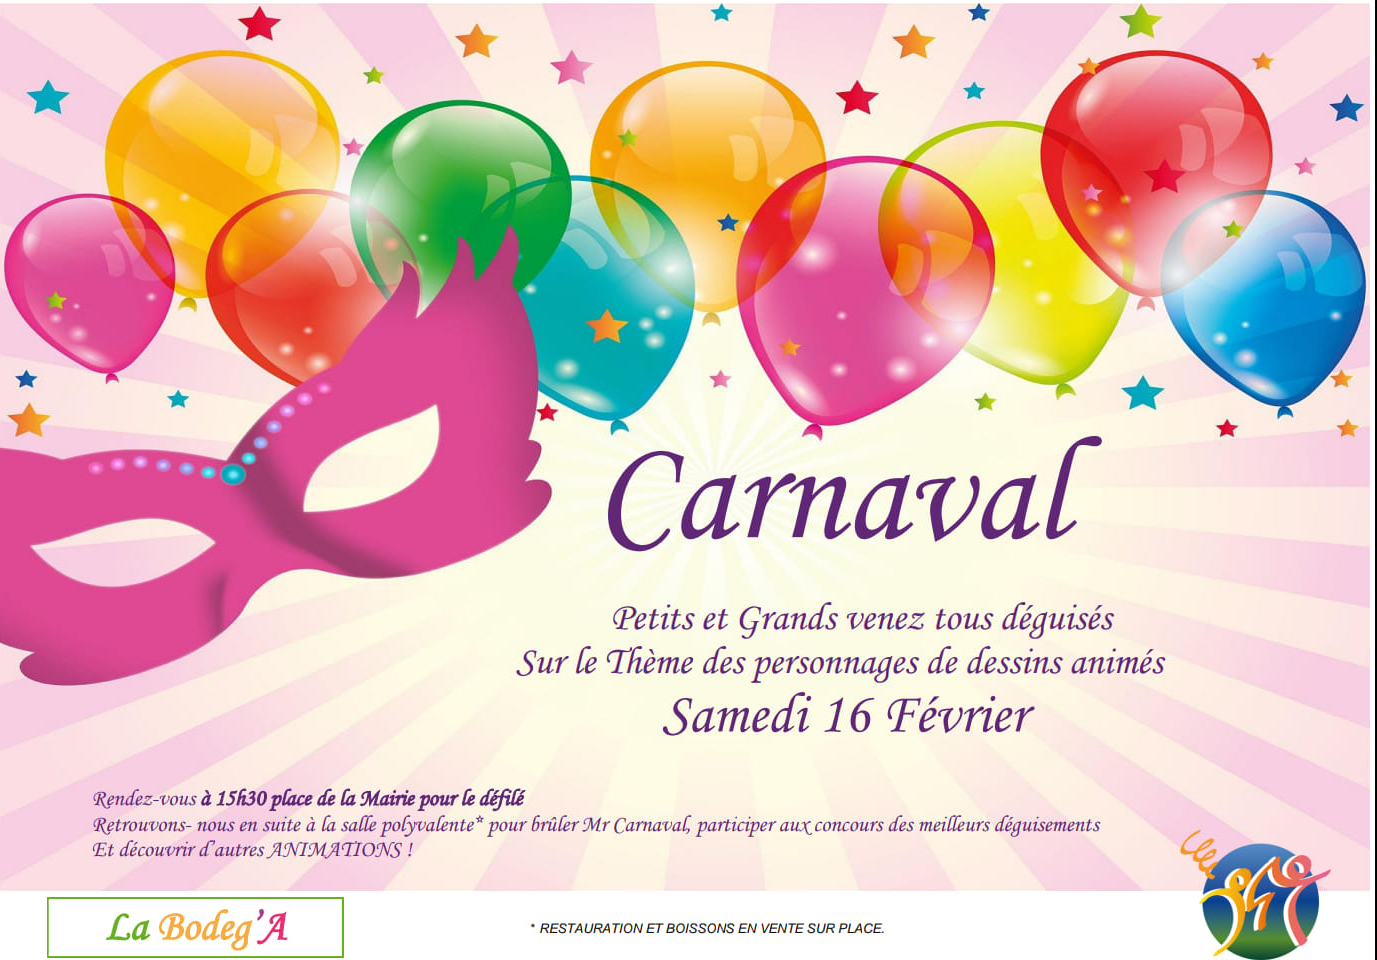 Carnaval organisé par La Bodeg'A